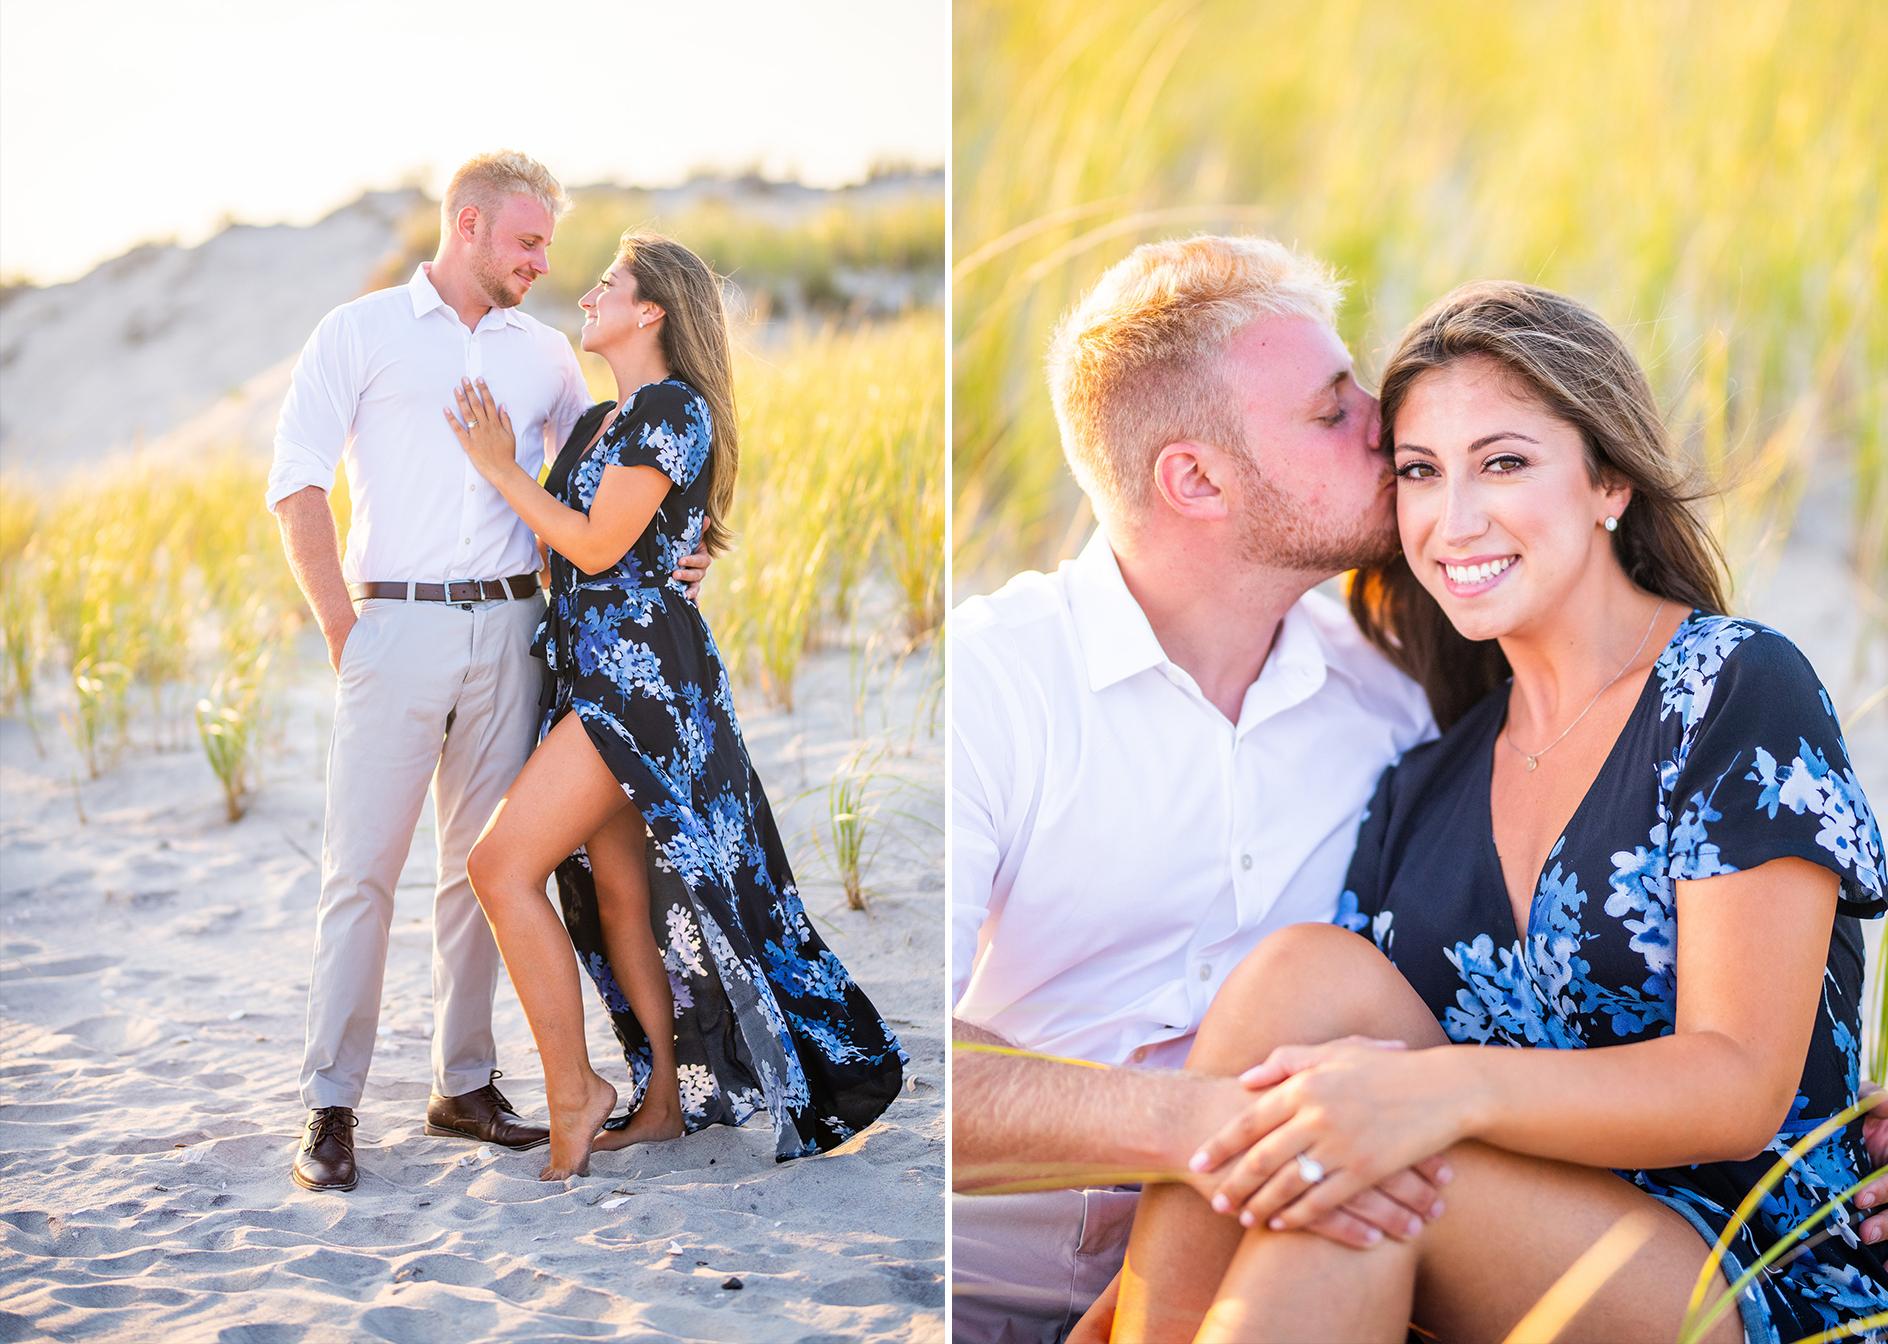 Dune Road Engagement Shoot | Westhampton Beach Engagement Shoot | Hamptons Wedding Photographer3